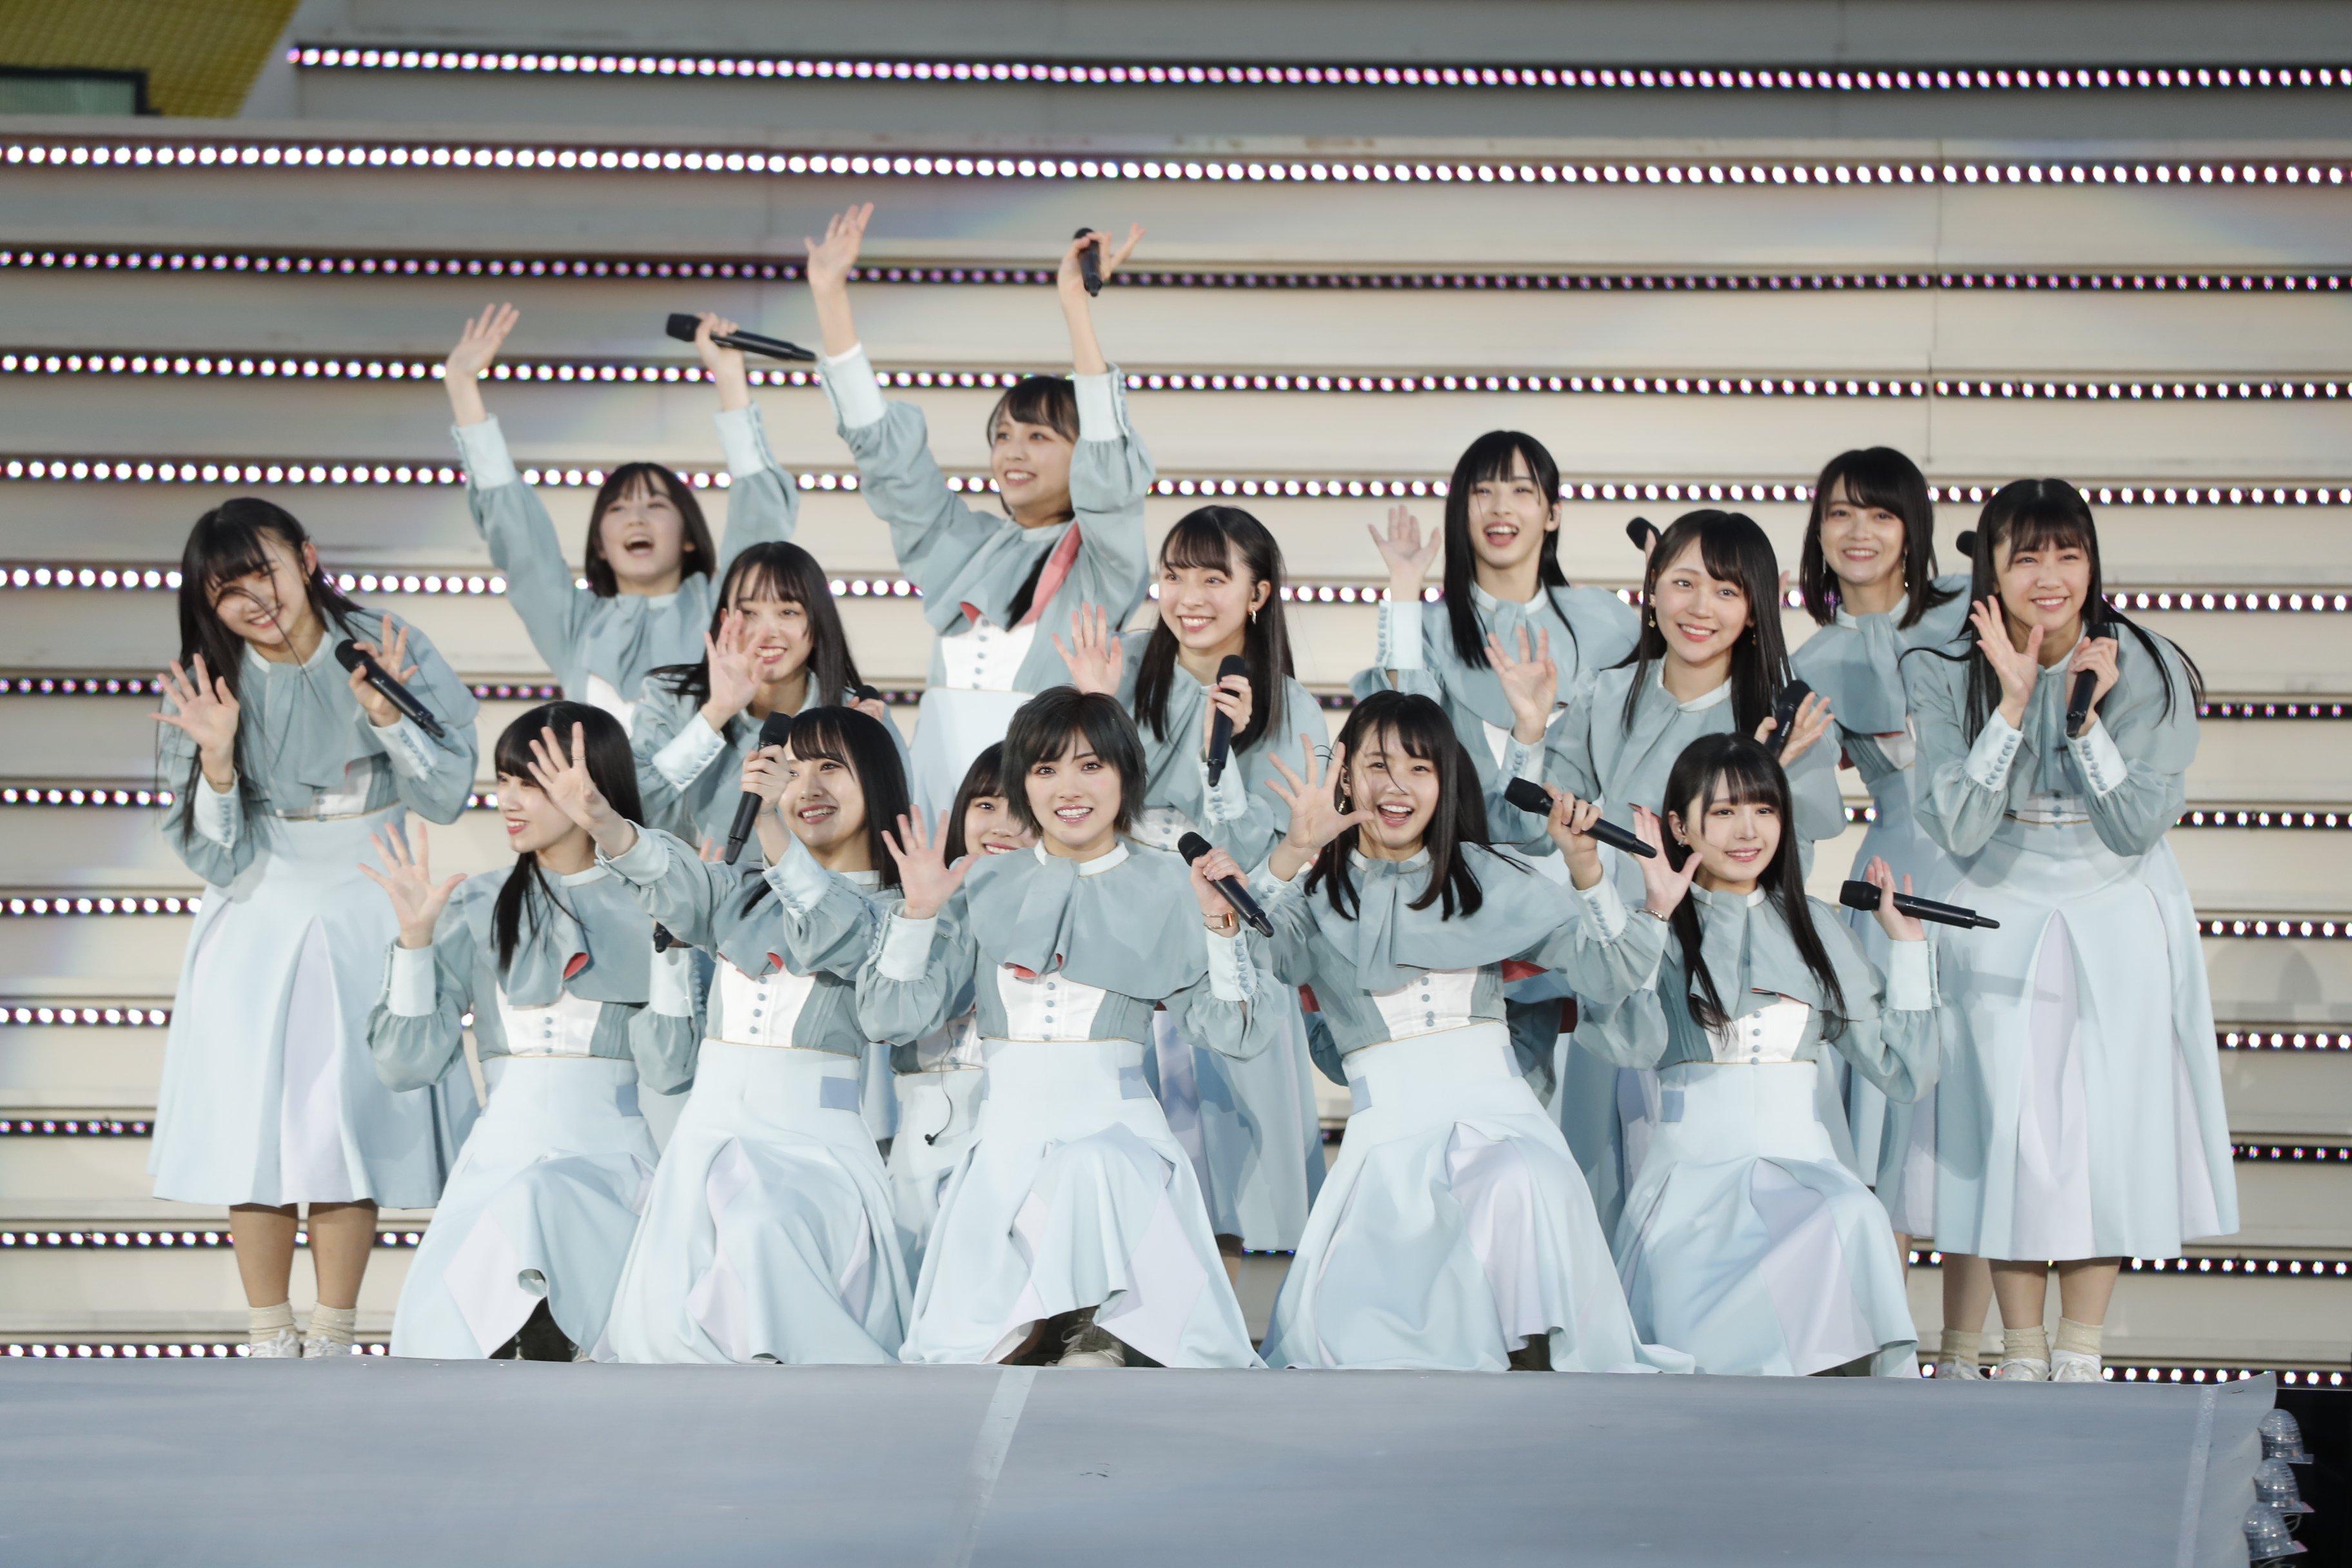 AKB48小嶋真子「笑顔で卒業」AKB48フェスのトリを飾る【写真19枚】の画像005